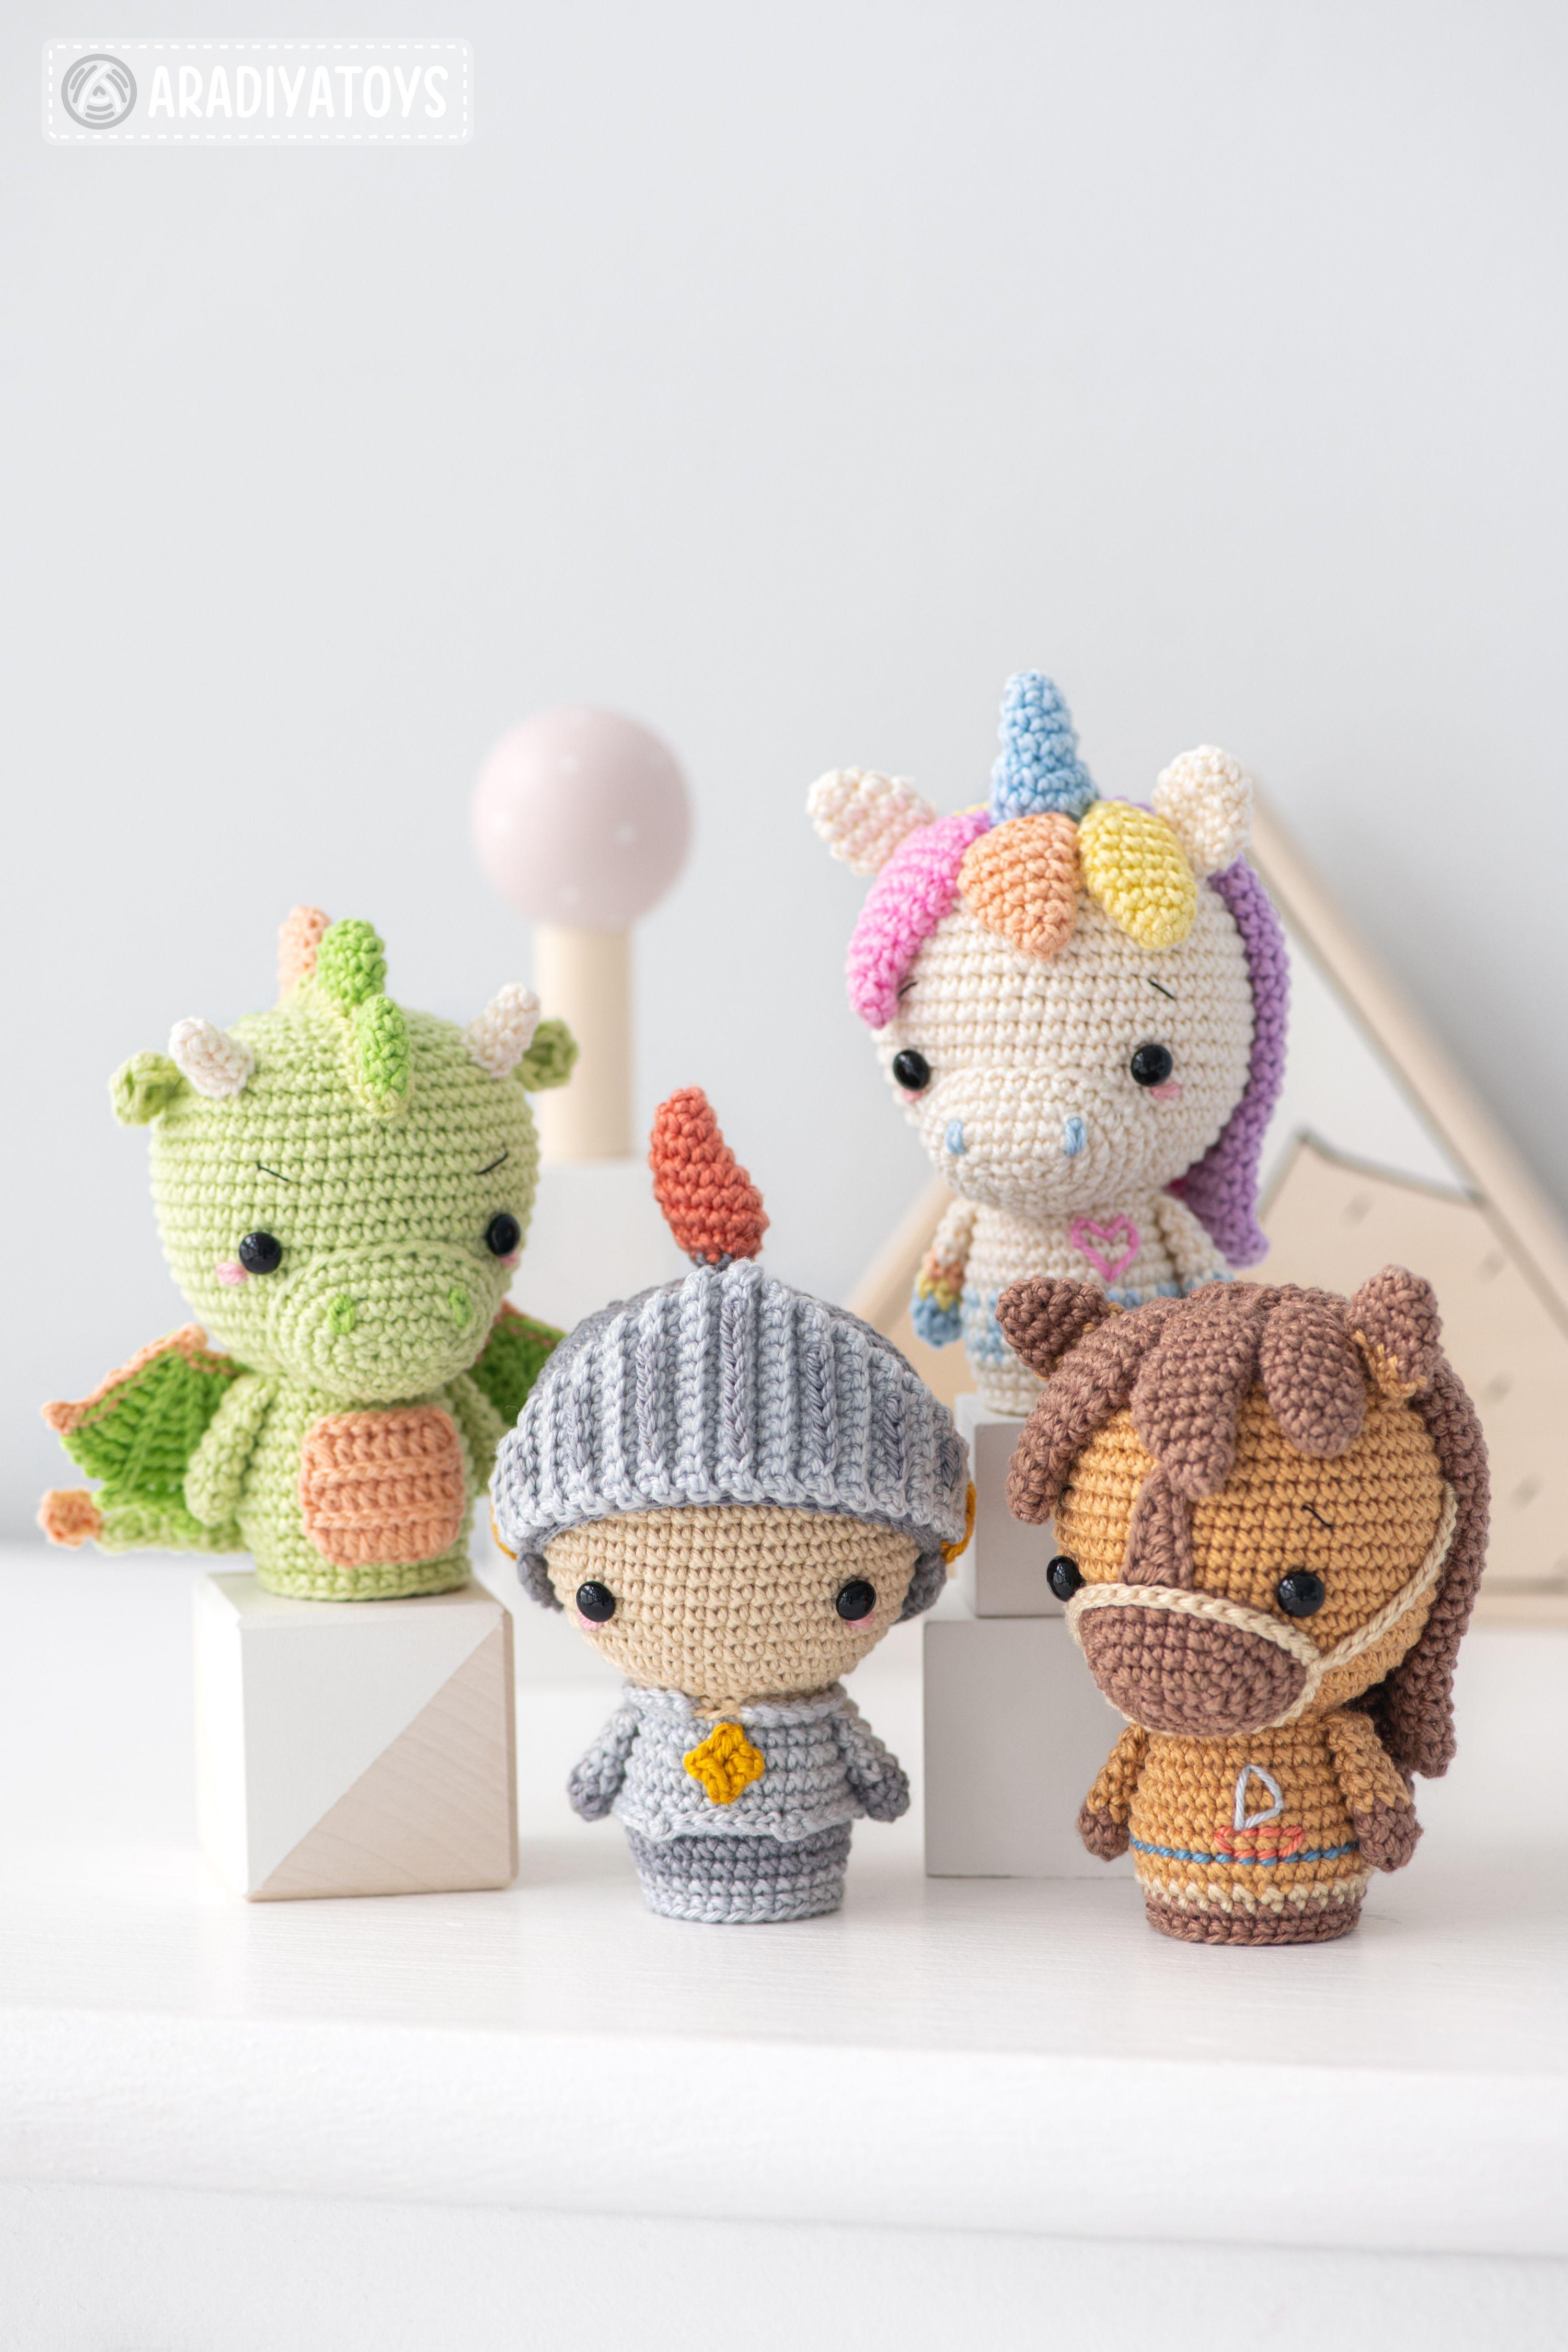 Amigurumi Egg Hunt eBook PDF Crochet Patterns